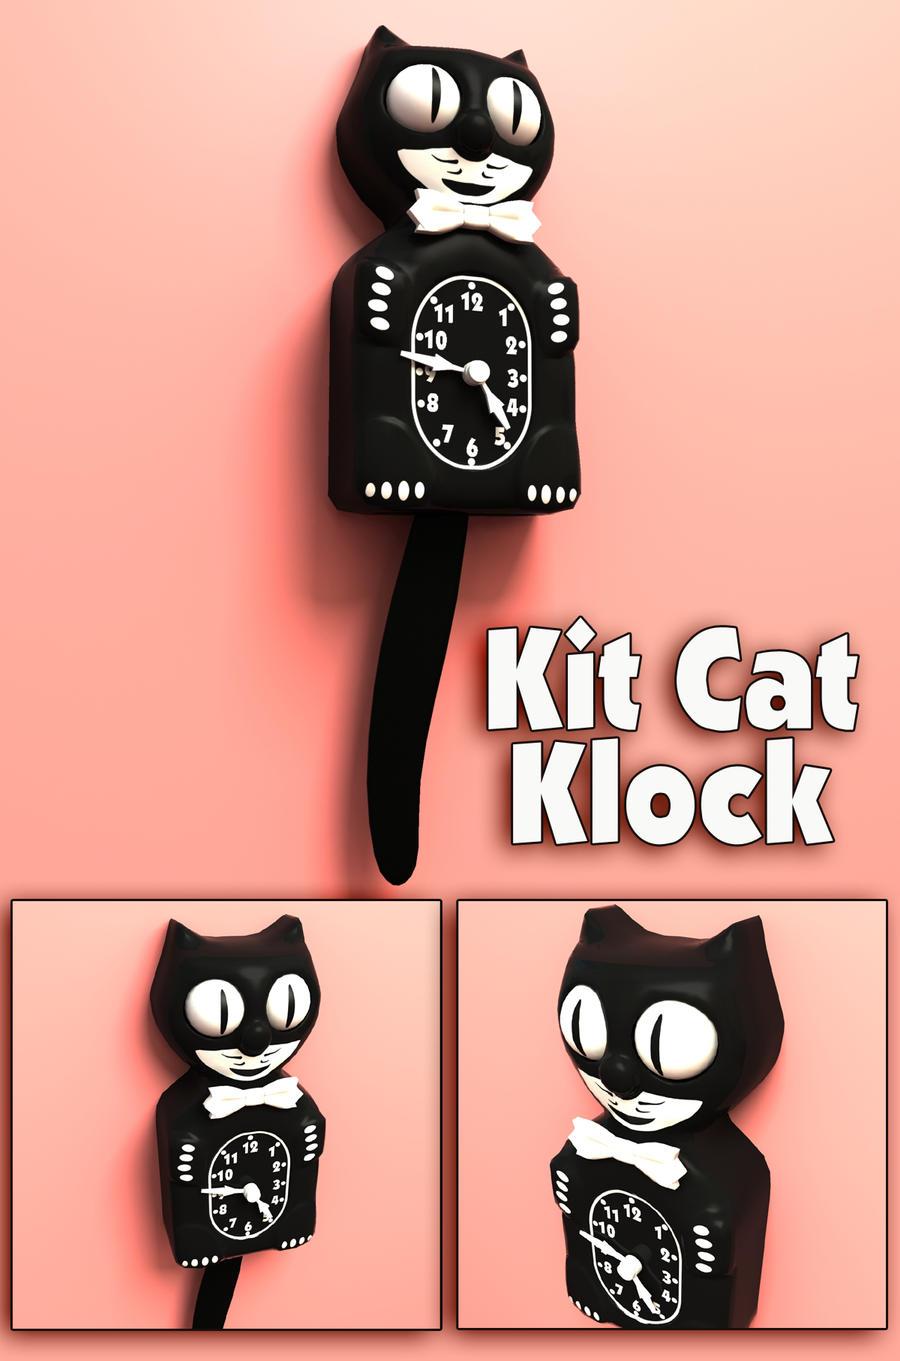 kit cat clock 3d model by sicklilmonky on deviantart. Black Bedroom Furniture Sets. Home Design Ideas